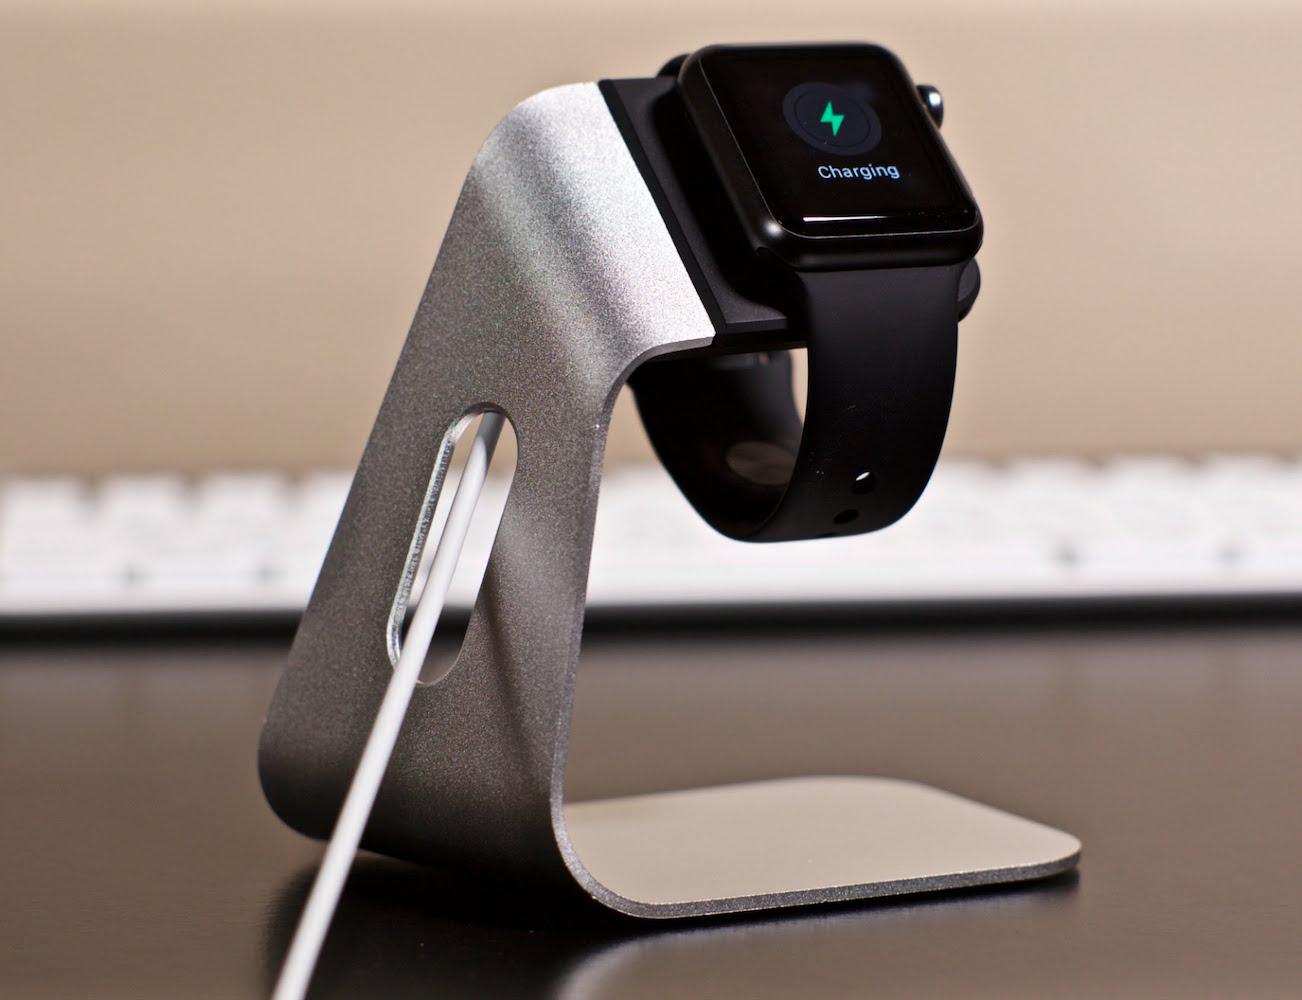 Spigen S330 Stand for Apple Watch